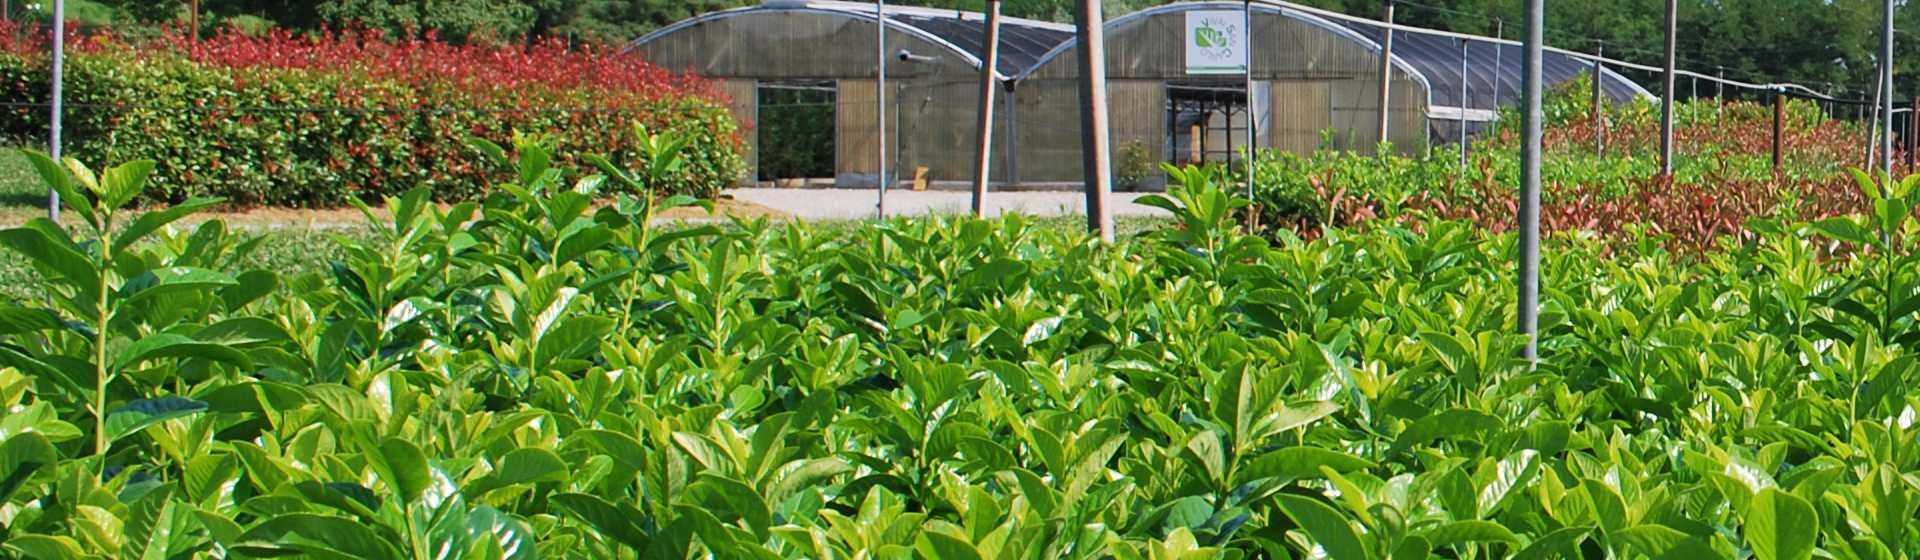 Vivaio piante da siepe produzione piante da siepe for Piante da vivaio